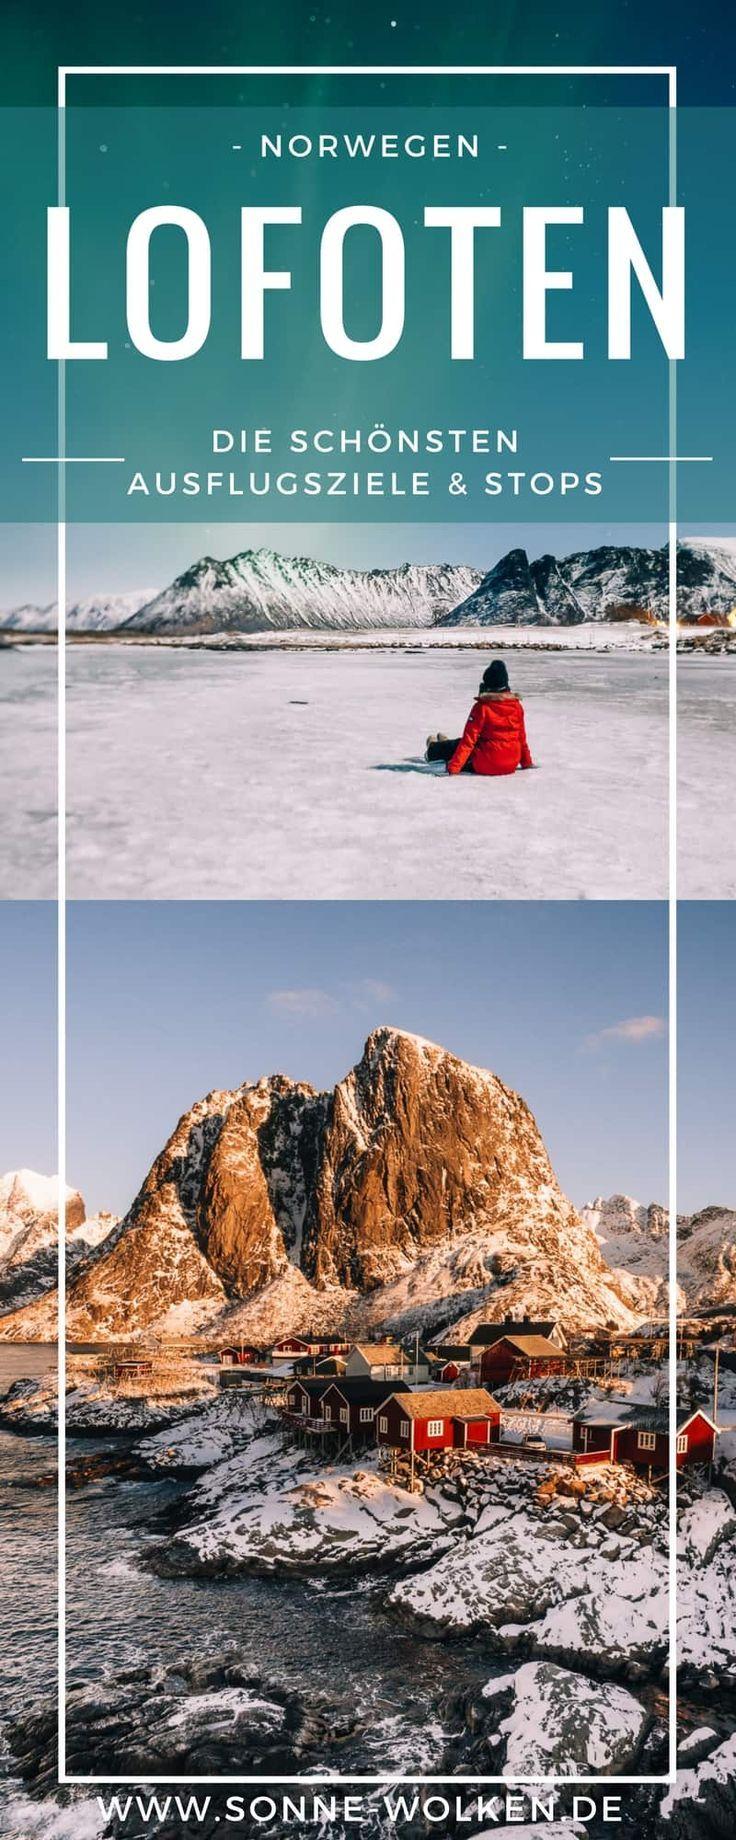 Lofoten – 11 Aktivitäten & Fotospots auf den Nordlandinseln in Norwegen – Ferngeweht